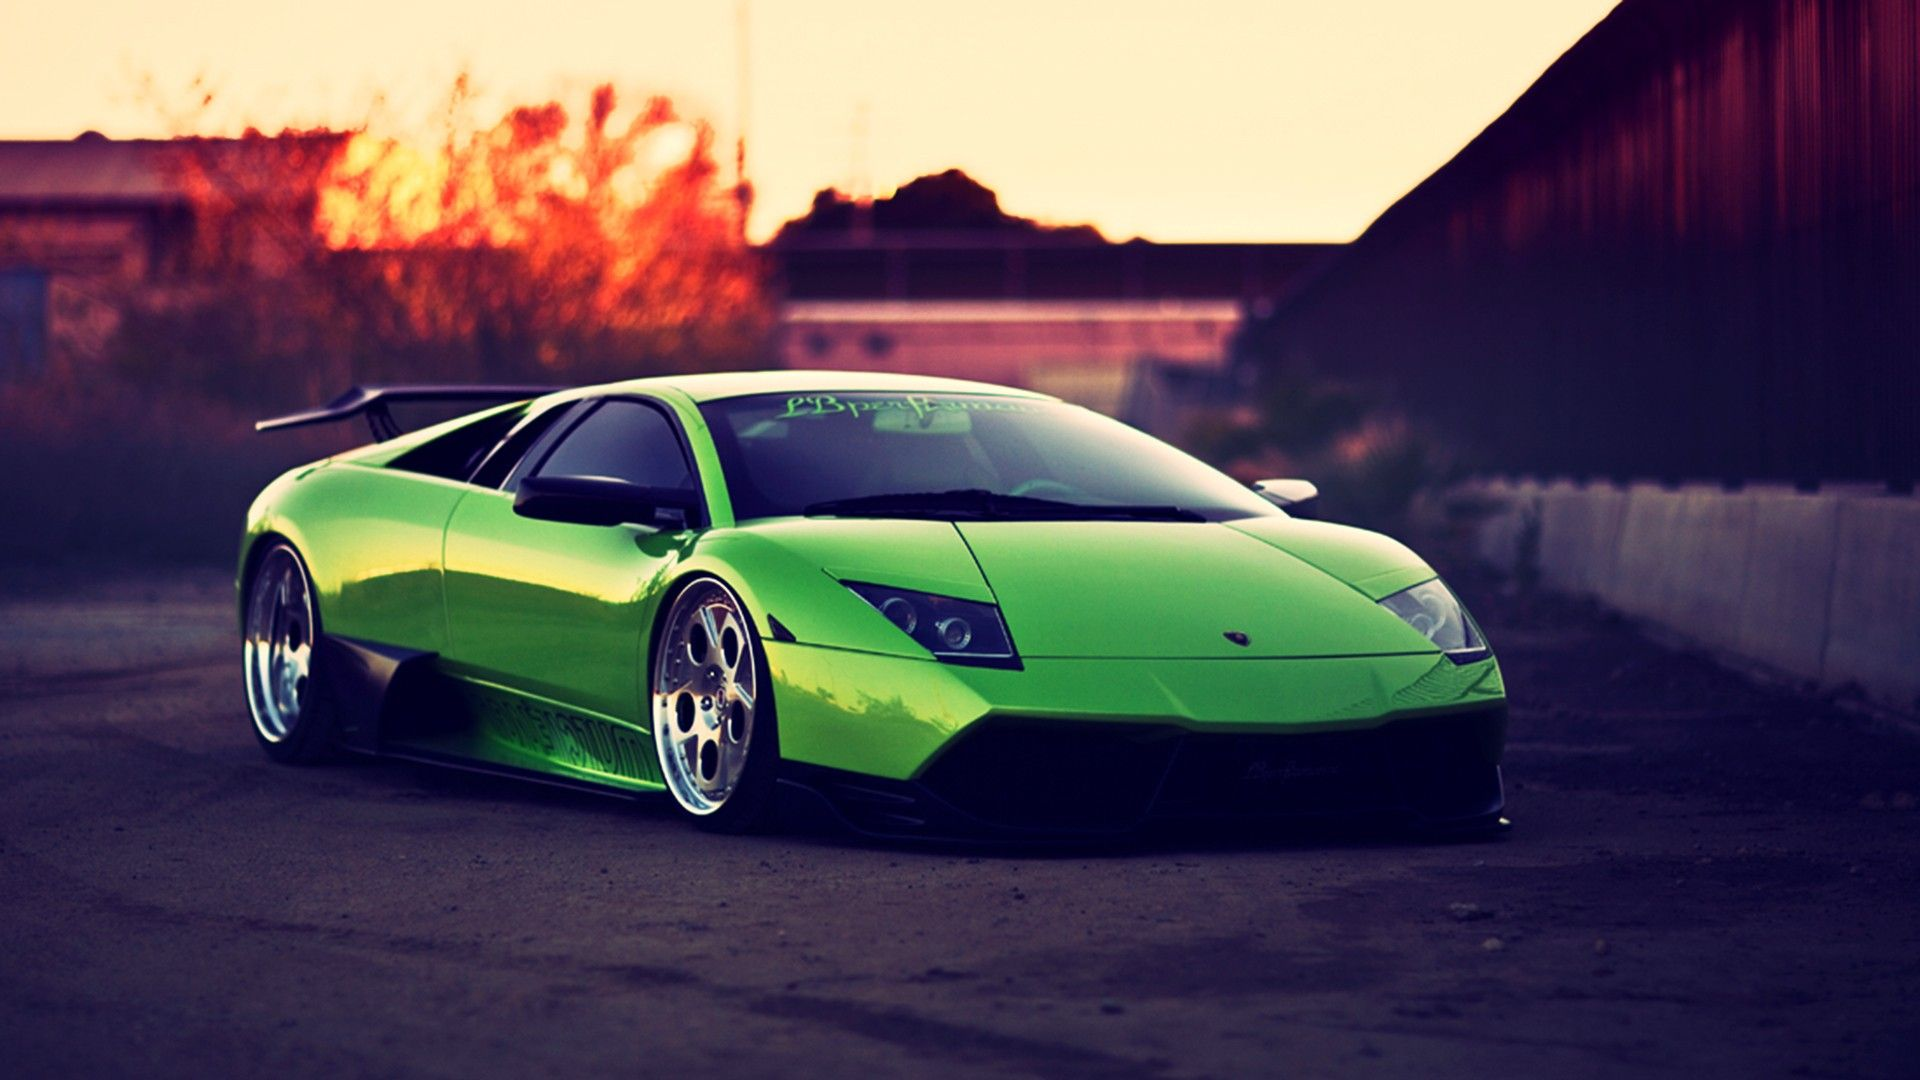 8b0a3848b677ff4ee15d0f8b5755ce0a Exciting Lamborghini Huracán Lp 610-4 Cena Cars Trend